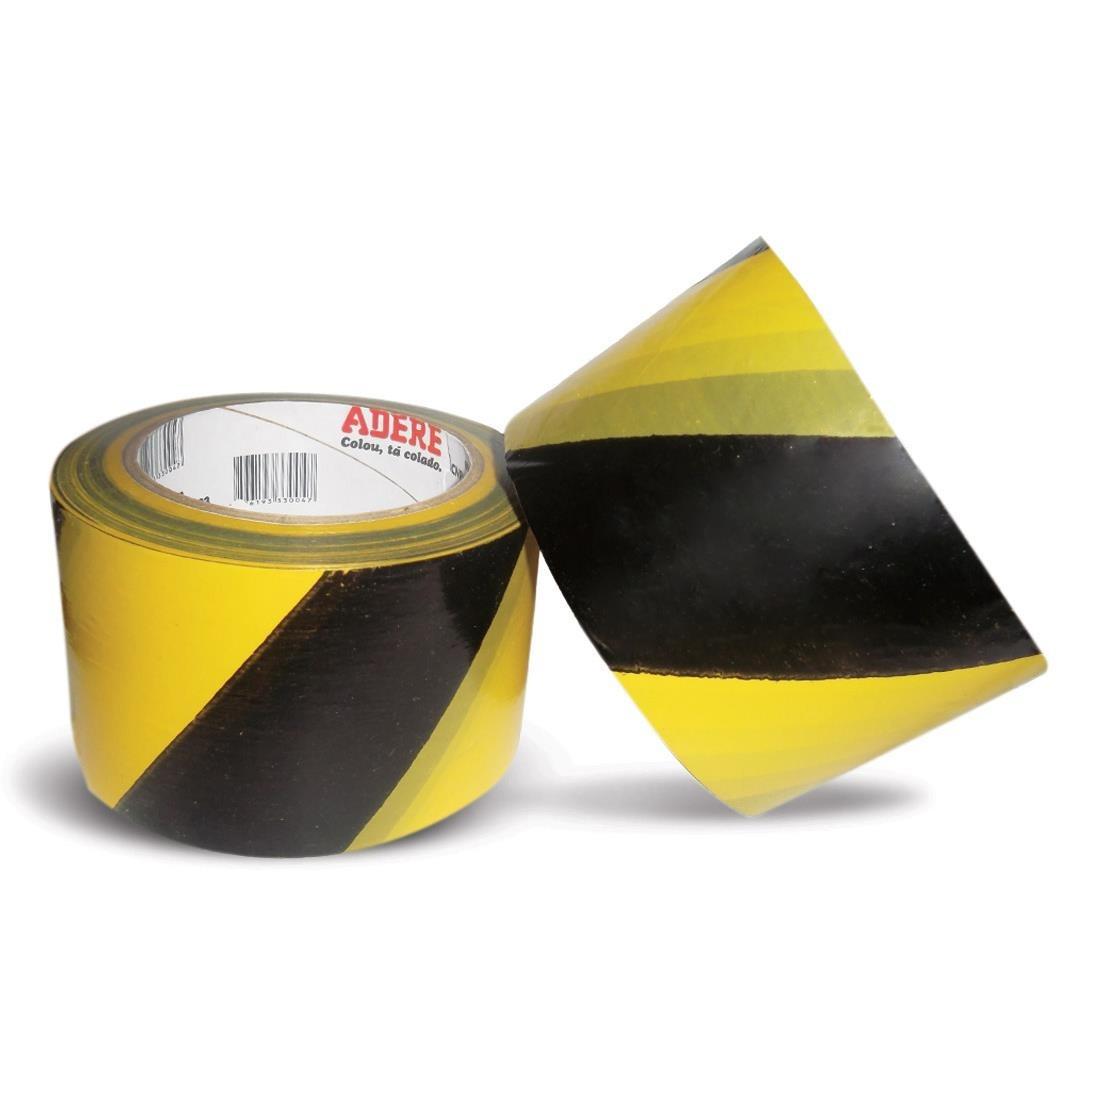 Fita Demarcacao 7mm x 200m Amarelo Zebrada 1 Unidade - Adere